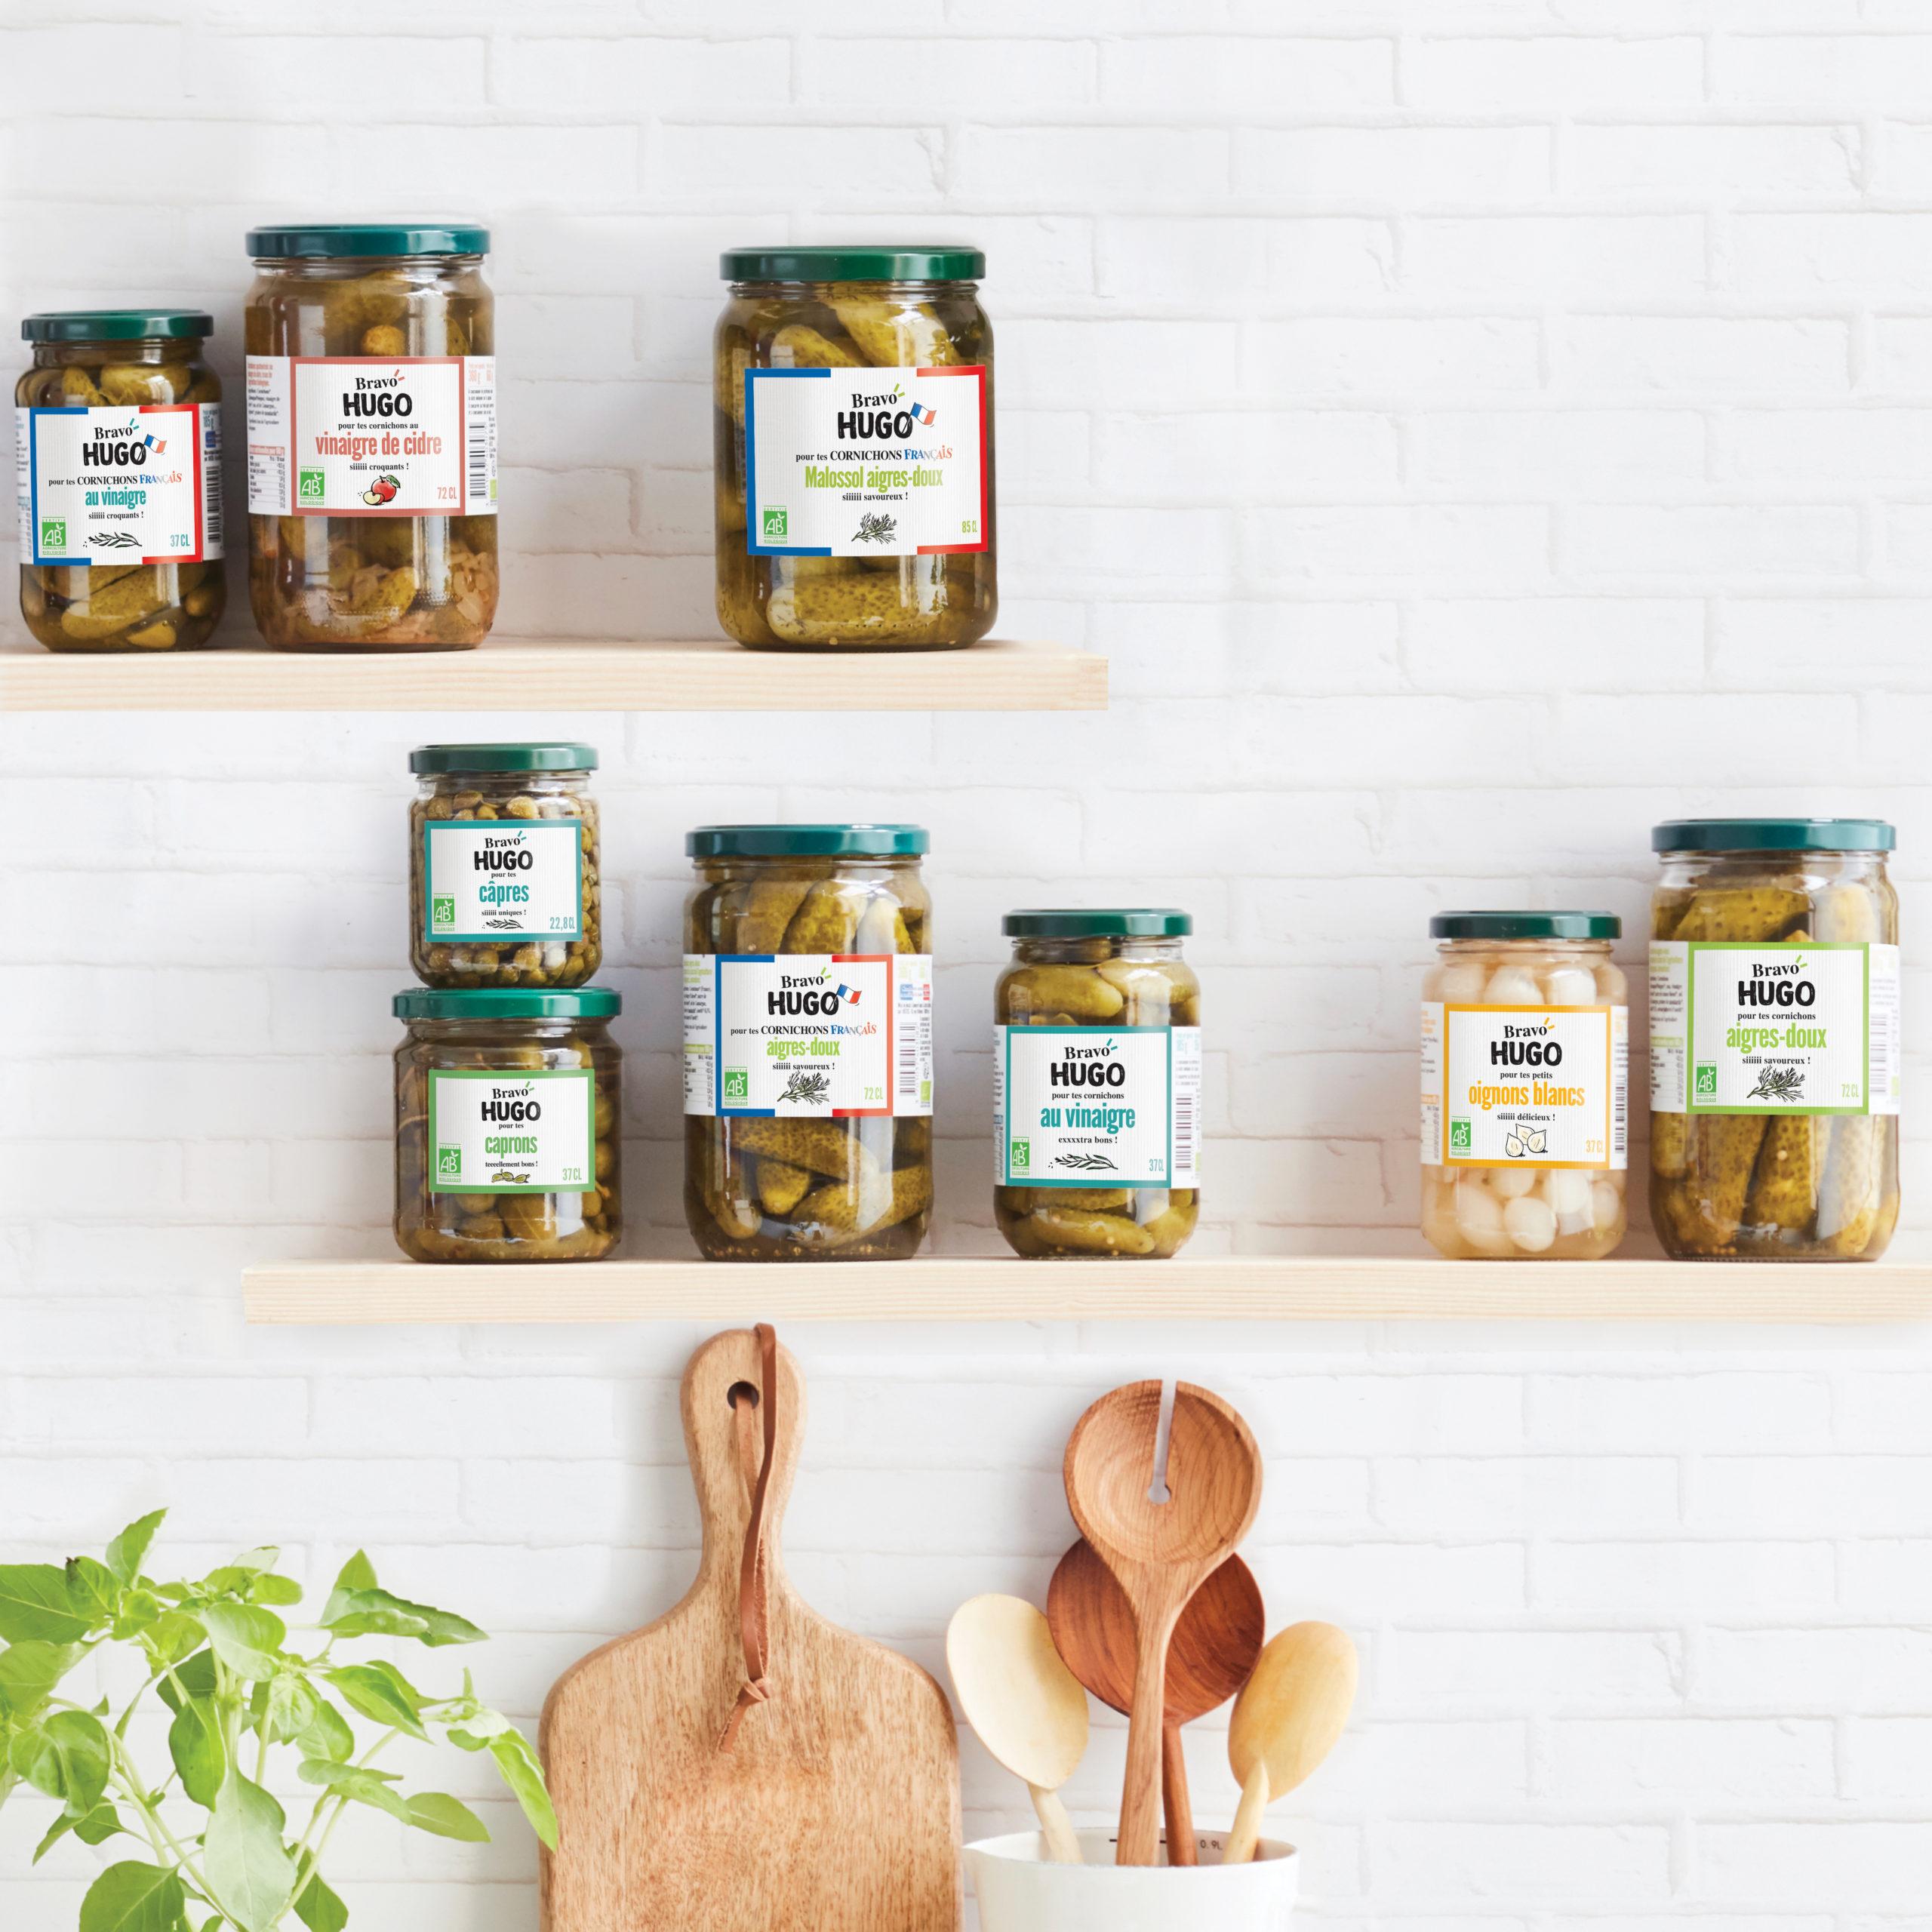 Bravo Hugo cornichons pickles